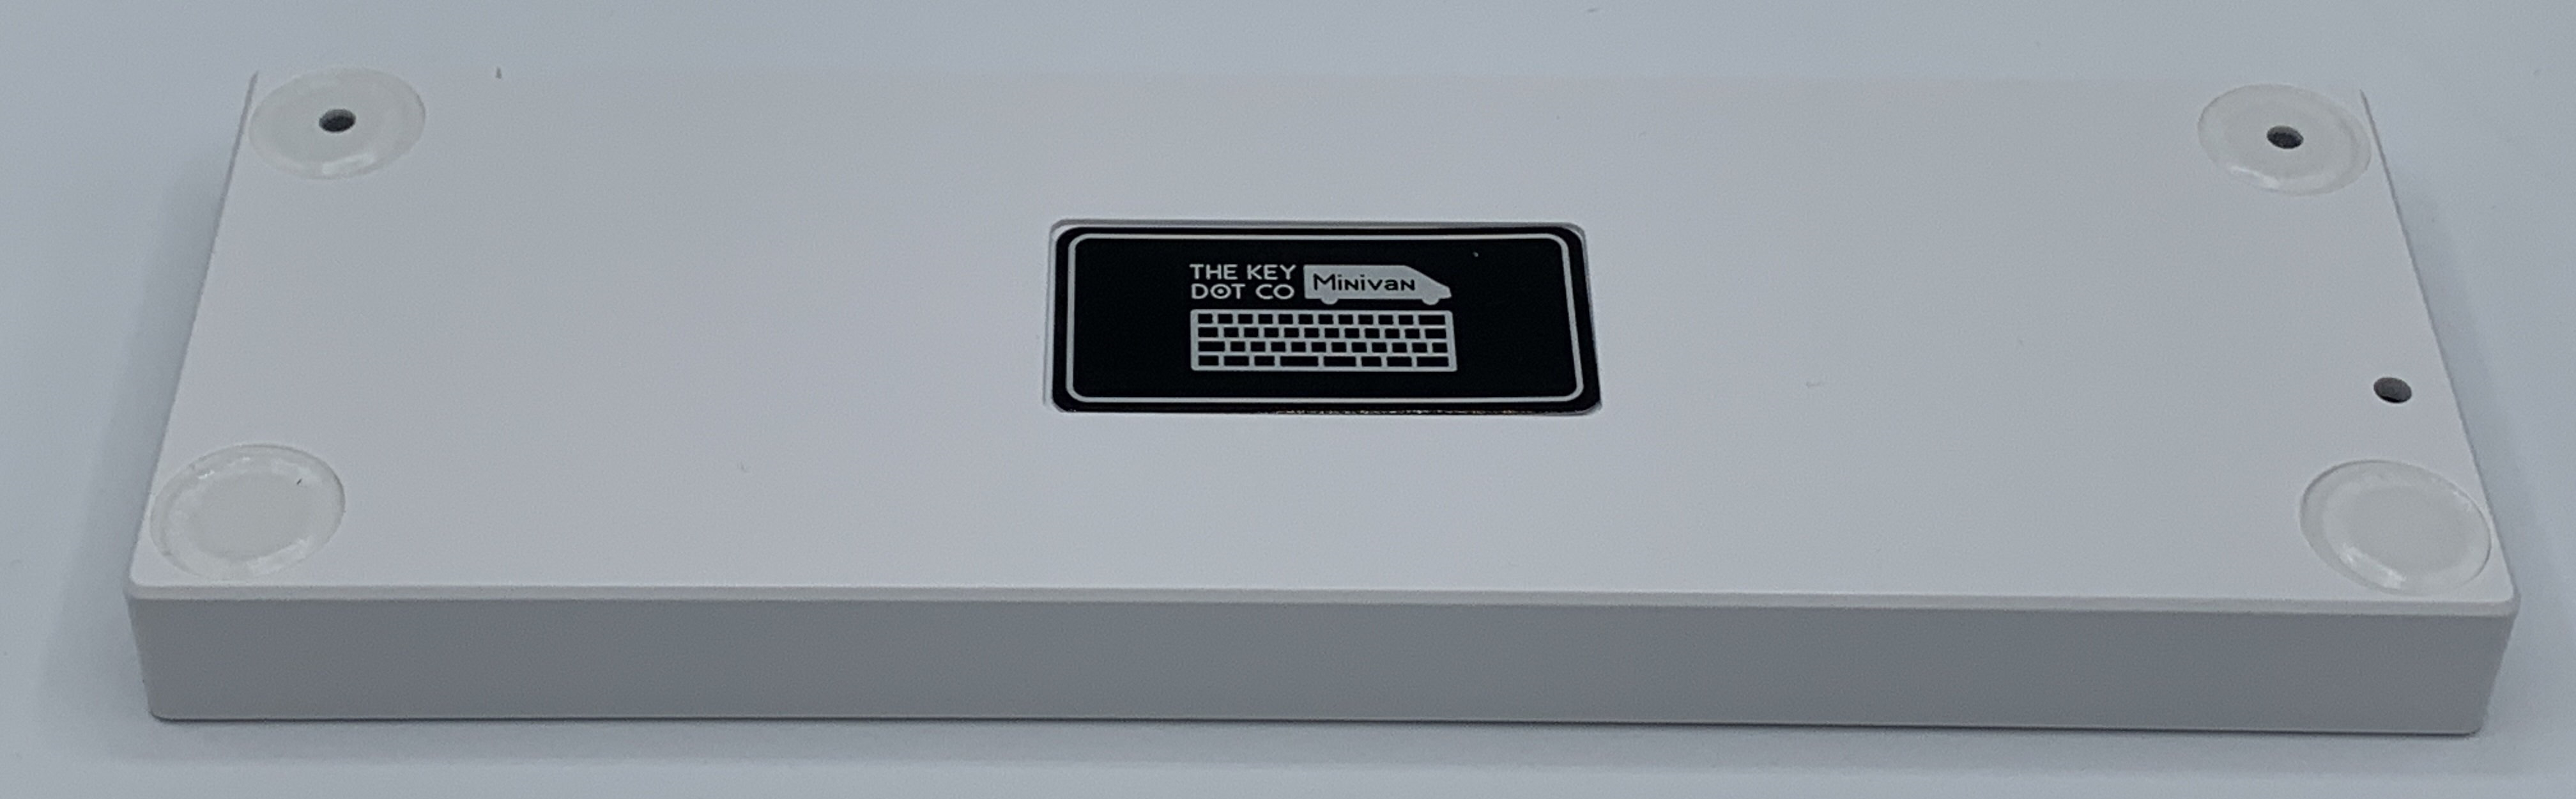 Bottom of the TheKey.Company white plastic case